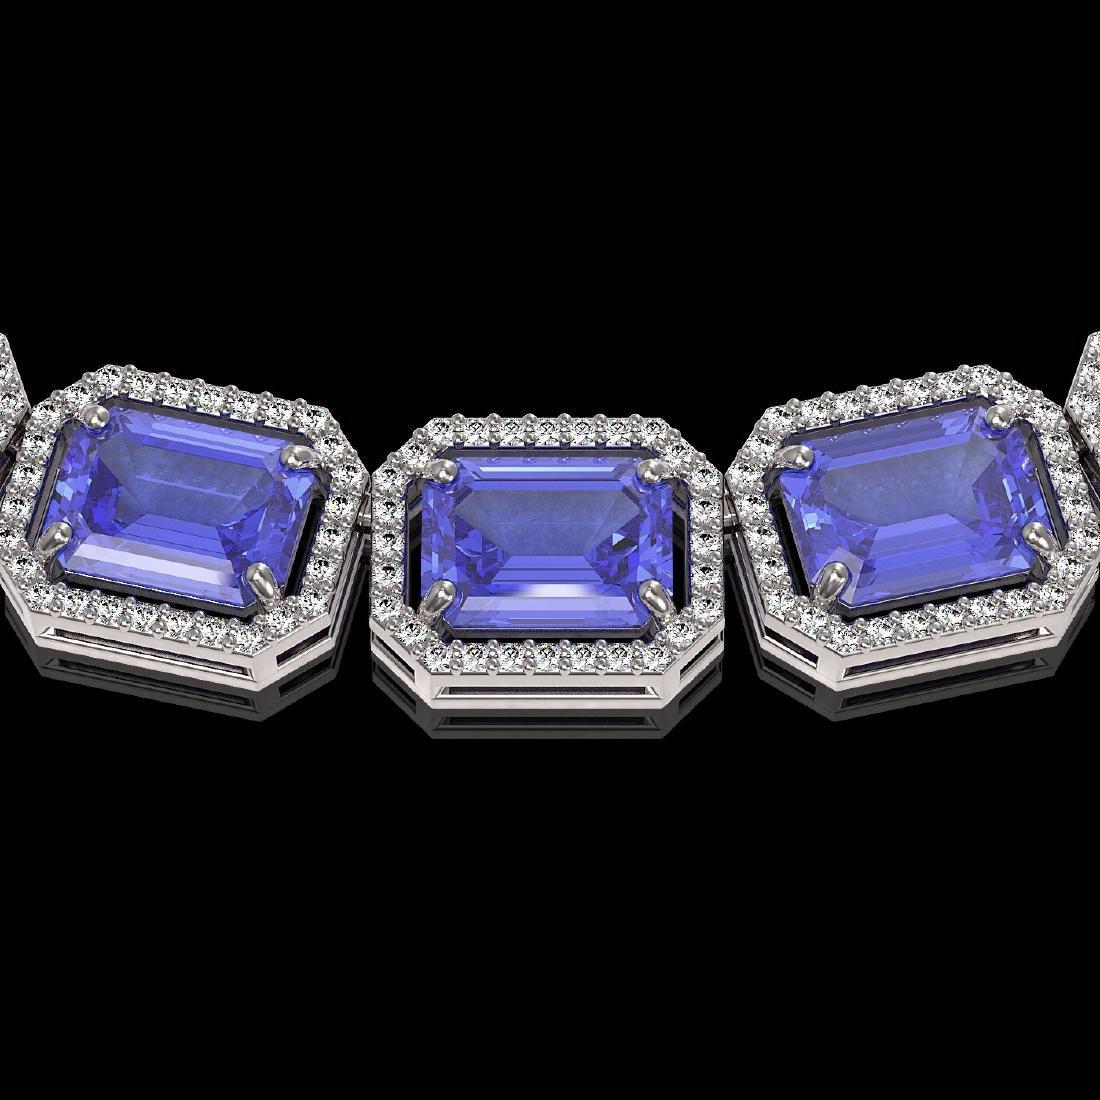 79.99 CTW Tanzanite & Diamond Halo Necklace 10K White - 3